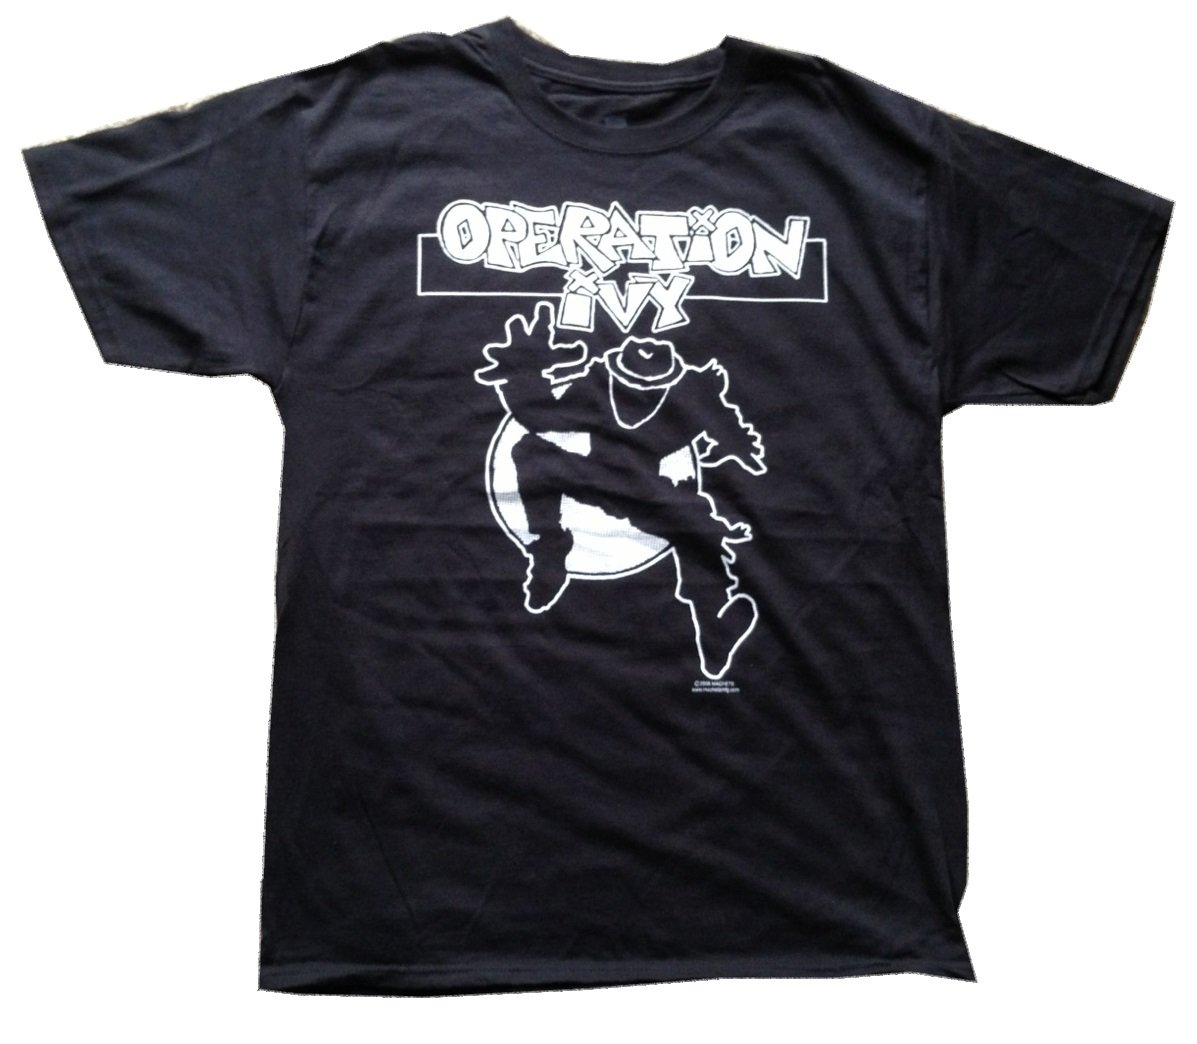 Operation Ivy Ska Man Black Tshirt